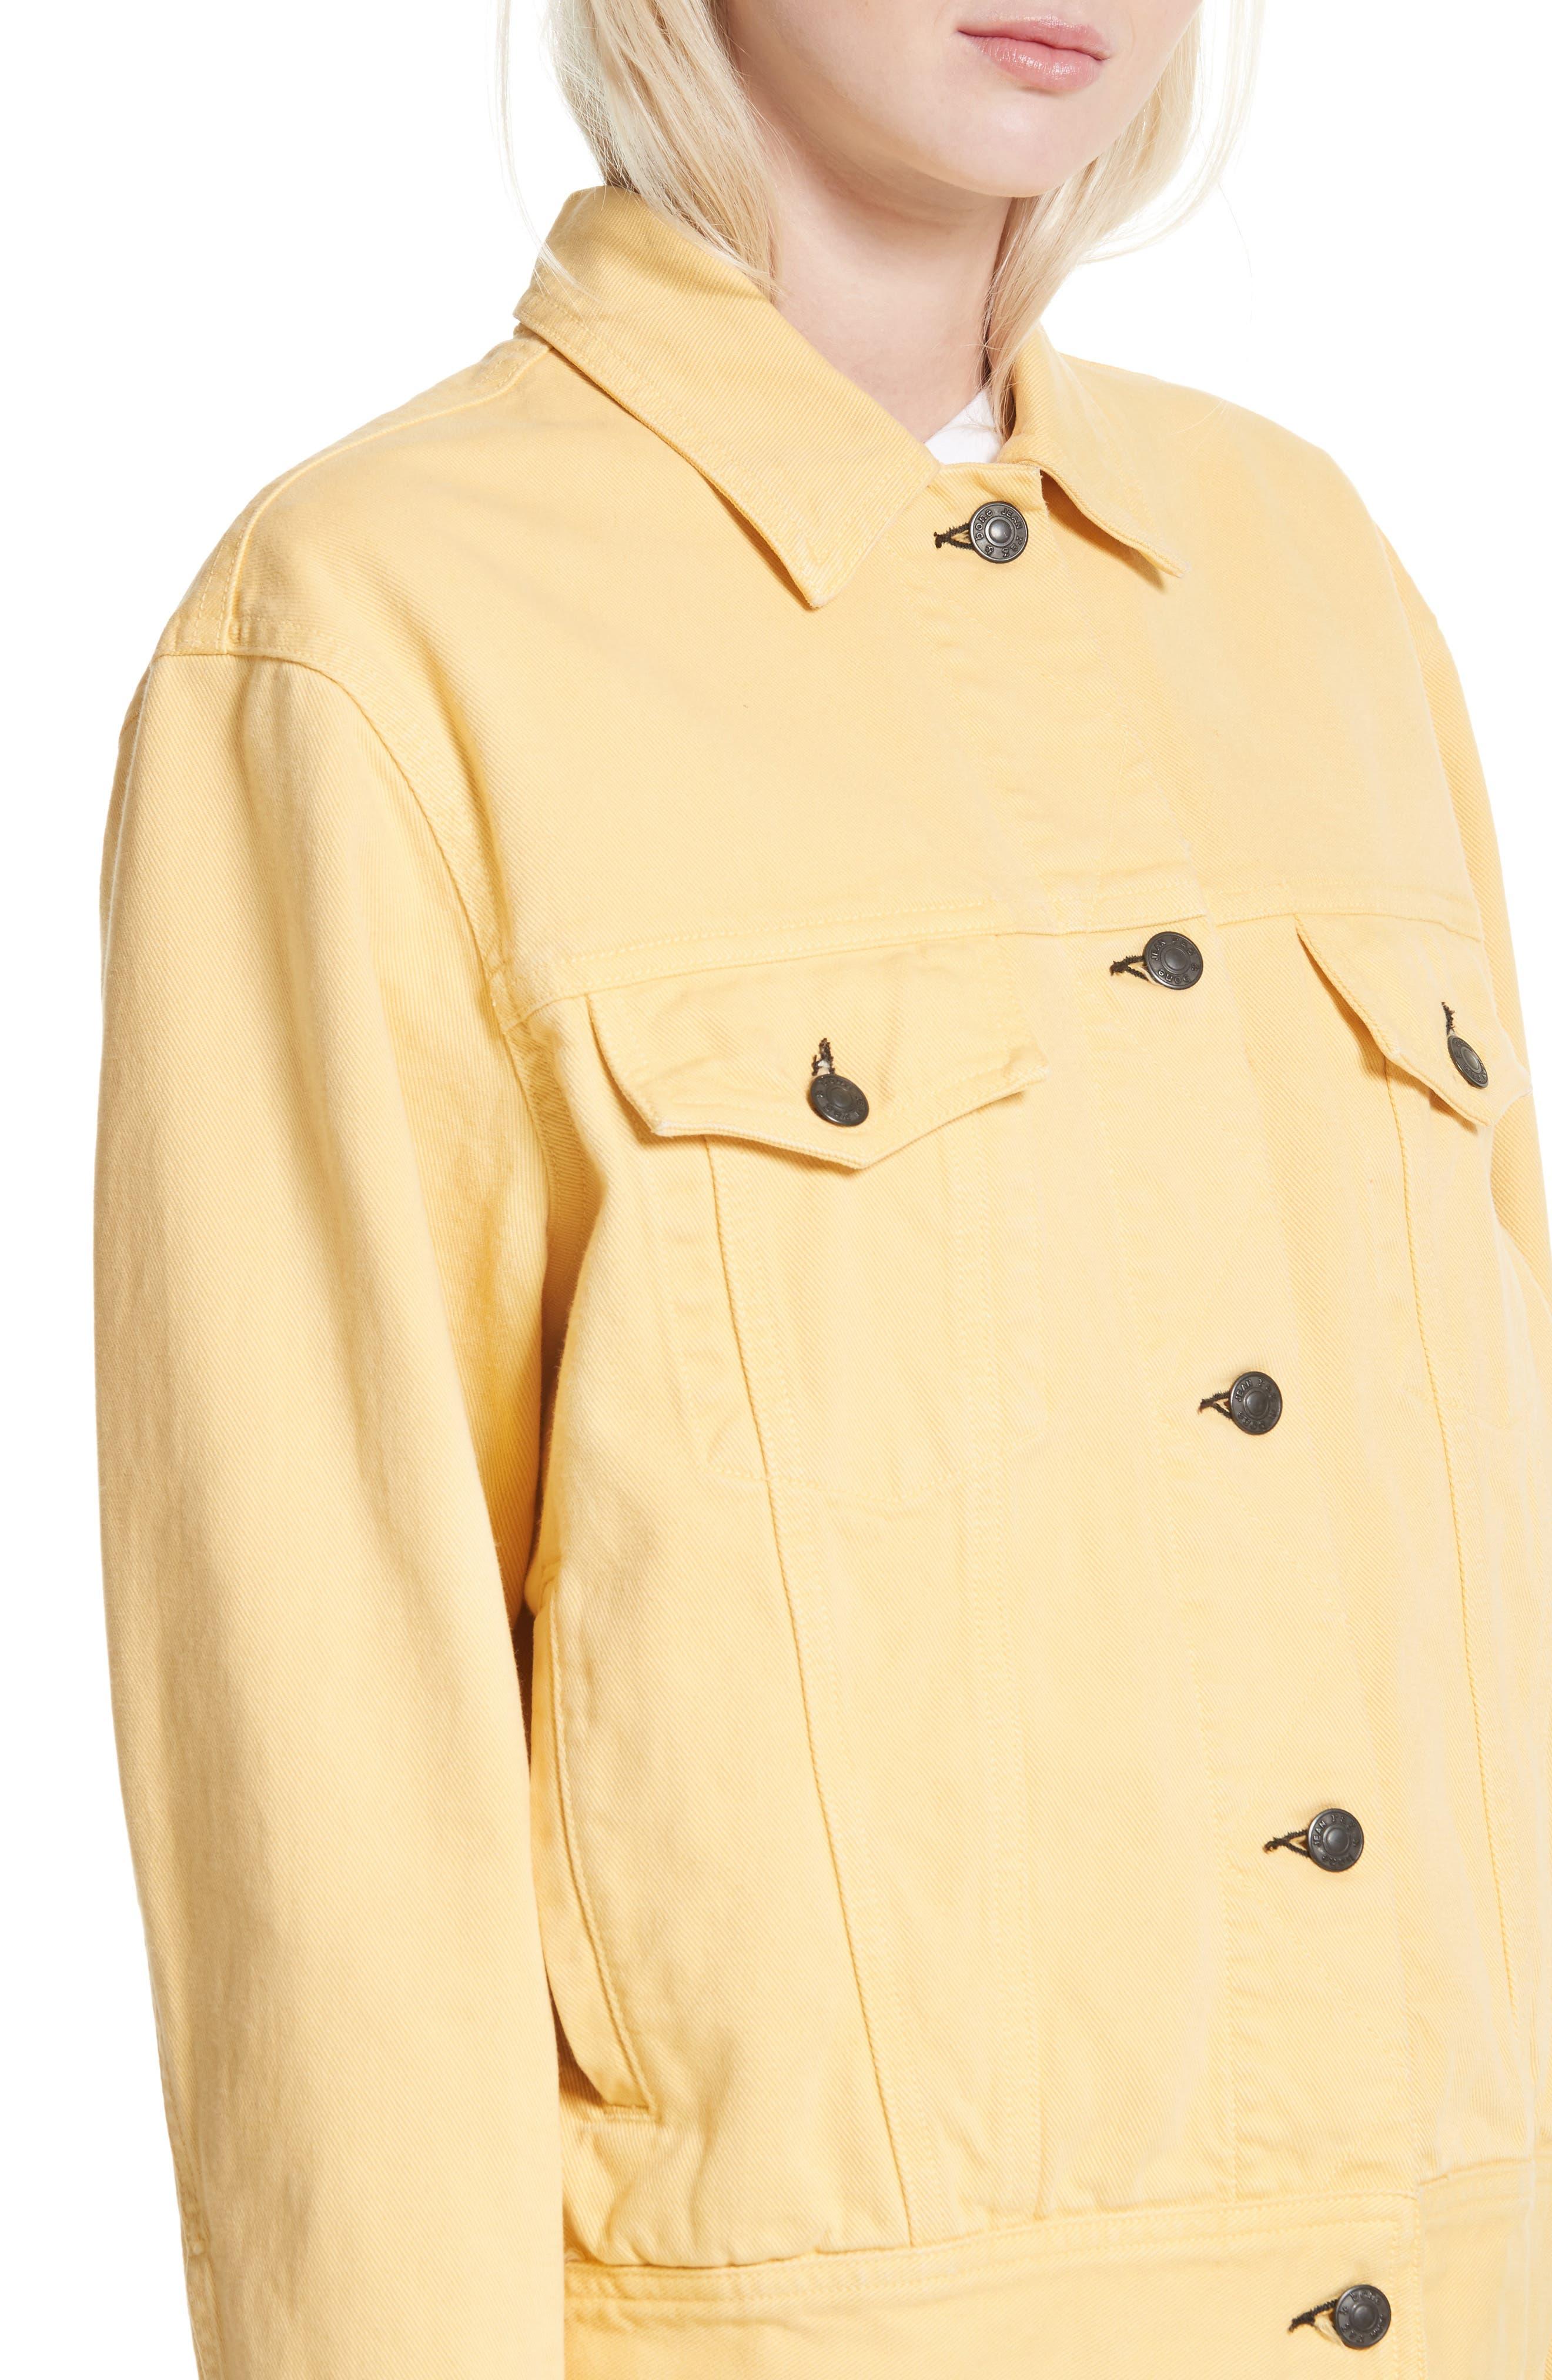 rag & bone Oversize Twill Jacket,                             Alternate thumbnail 4, color,                             Sunrise